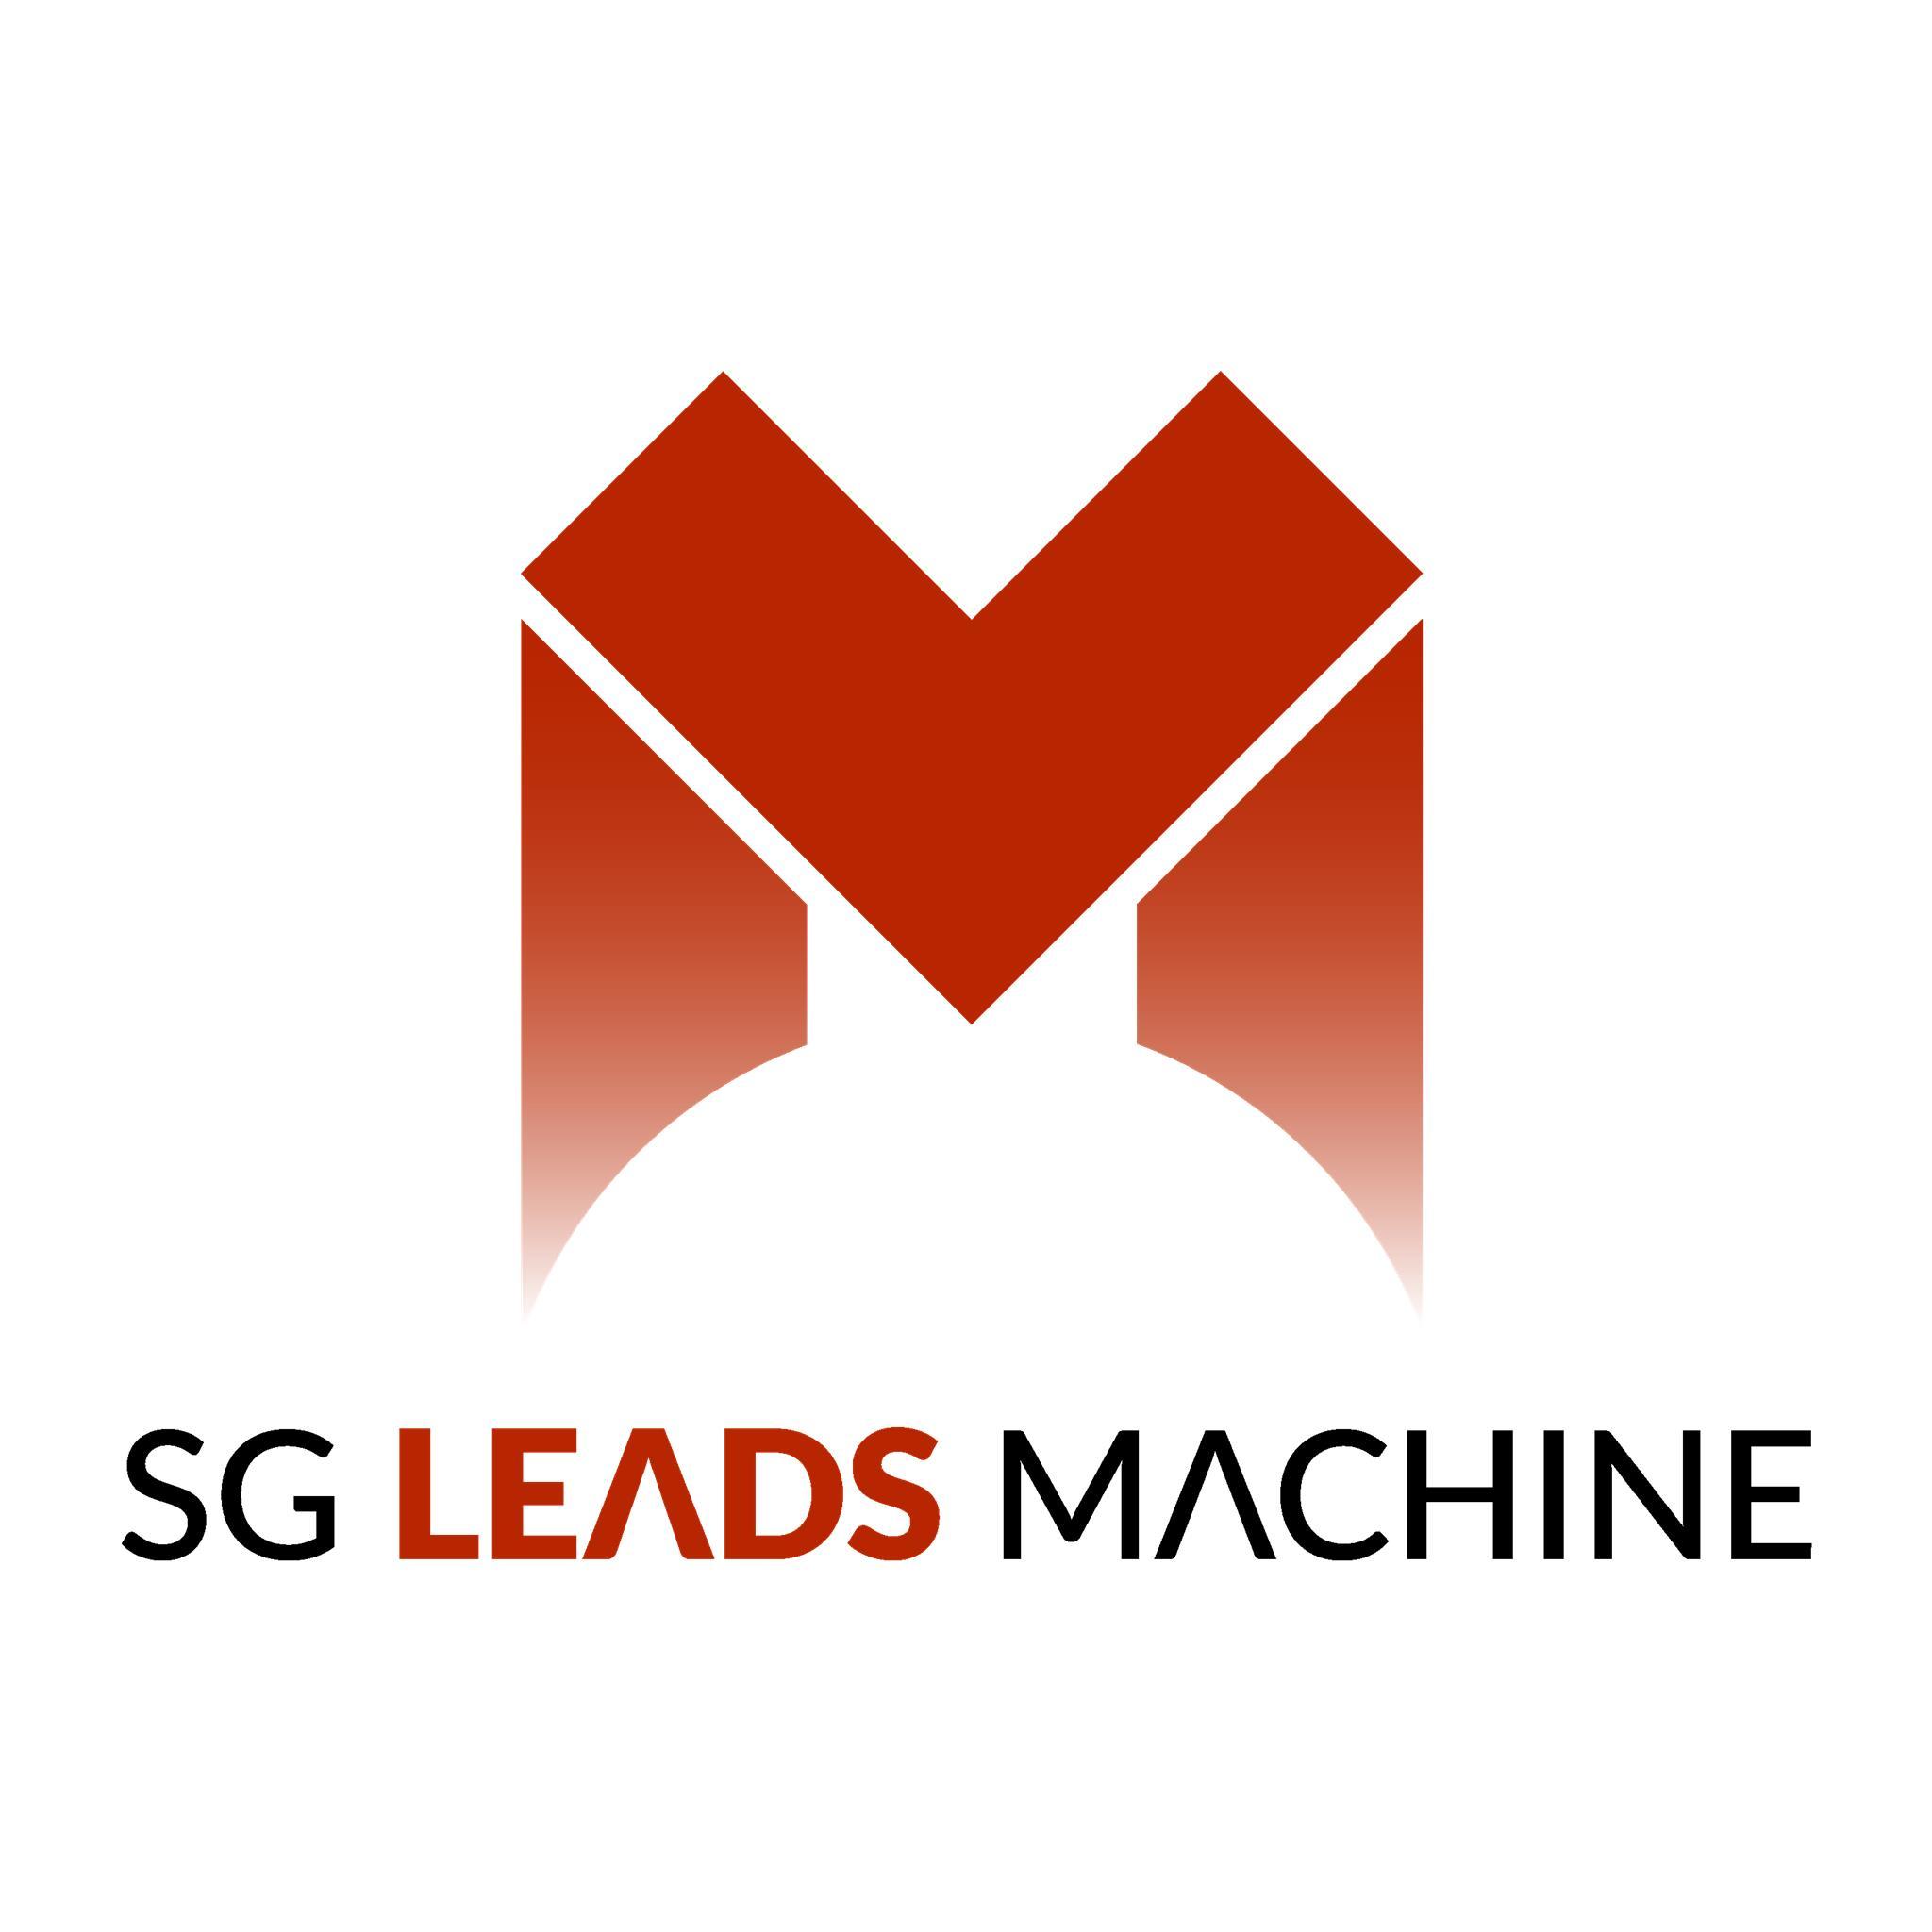 SG Leads Machine logo